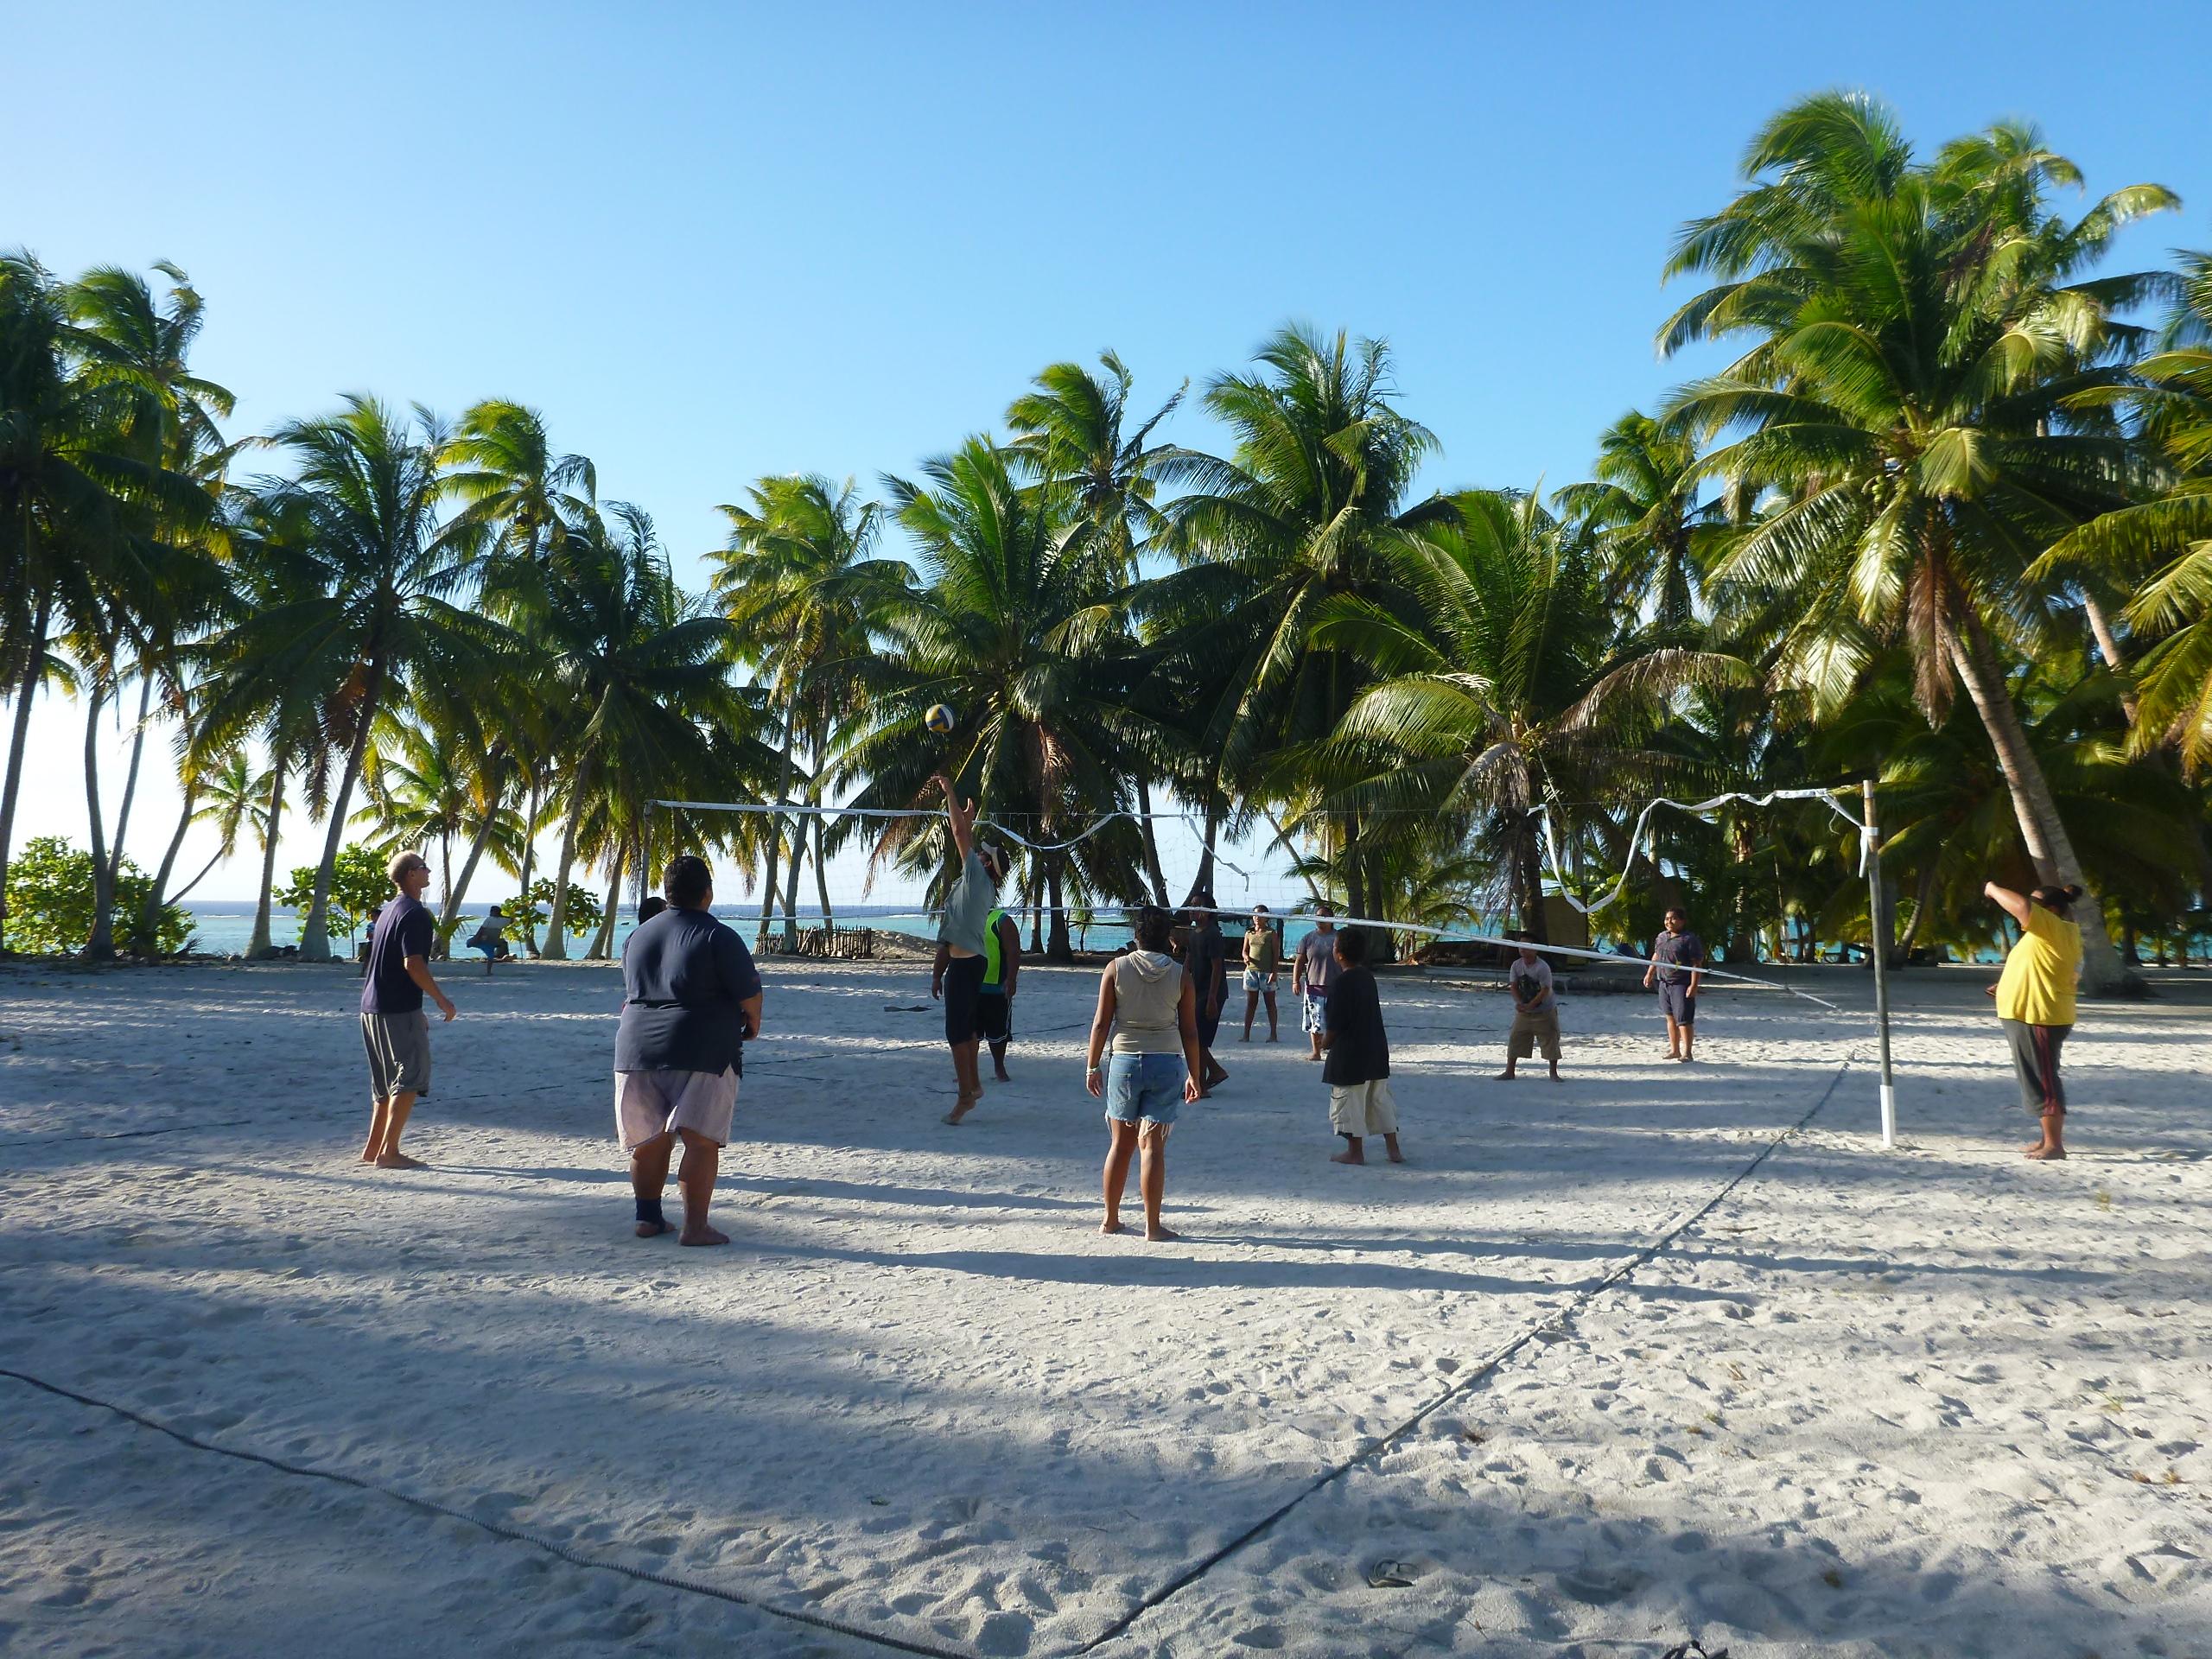 Penduduk Pulau Palmerston bermain voli